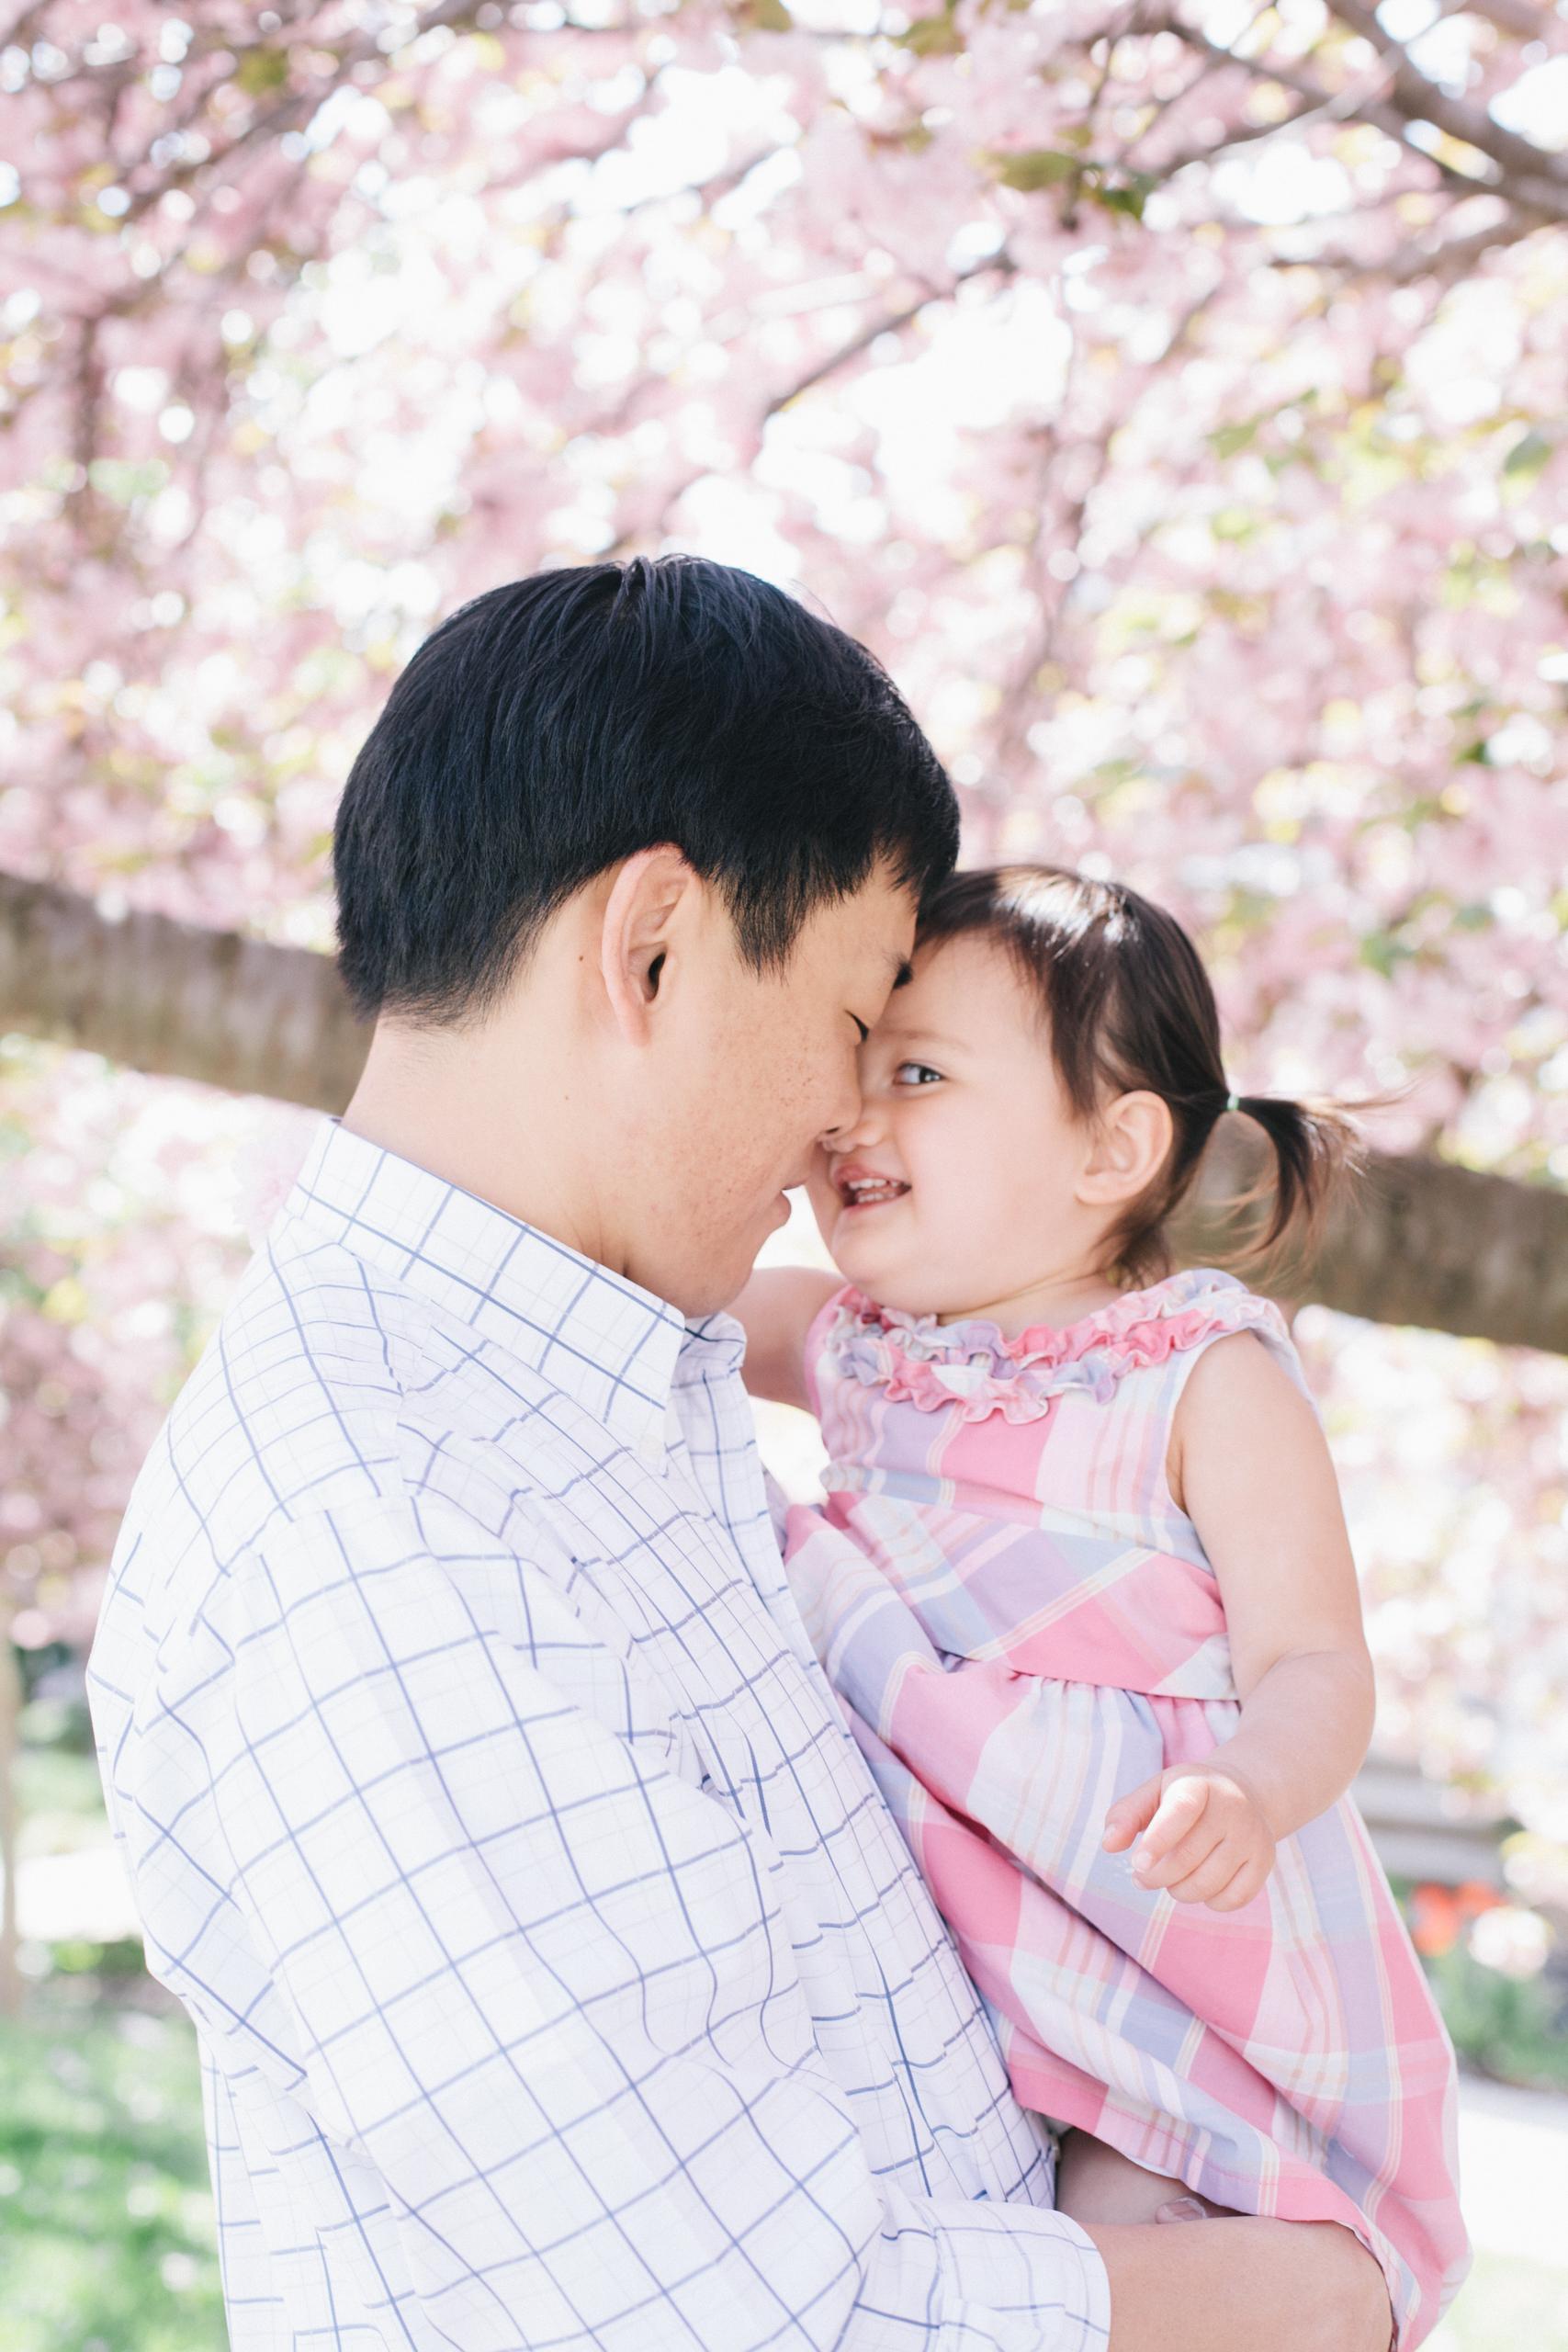 Son_Family_April_017.jpg